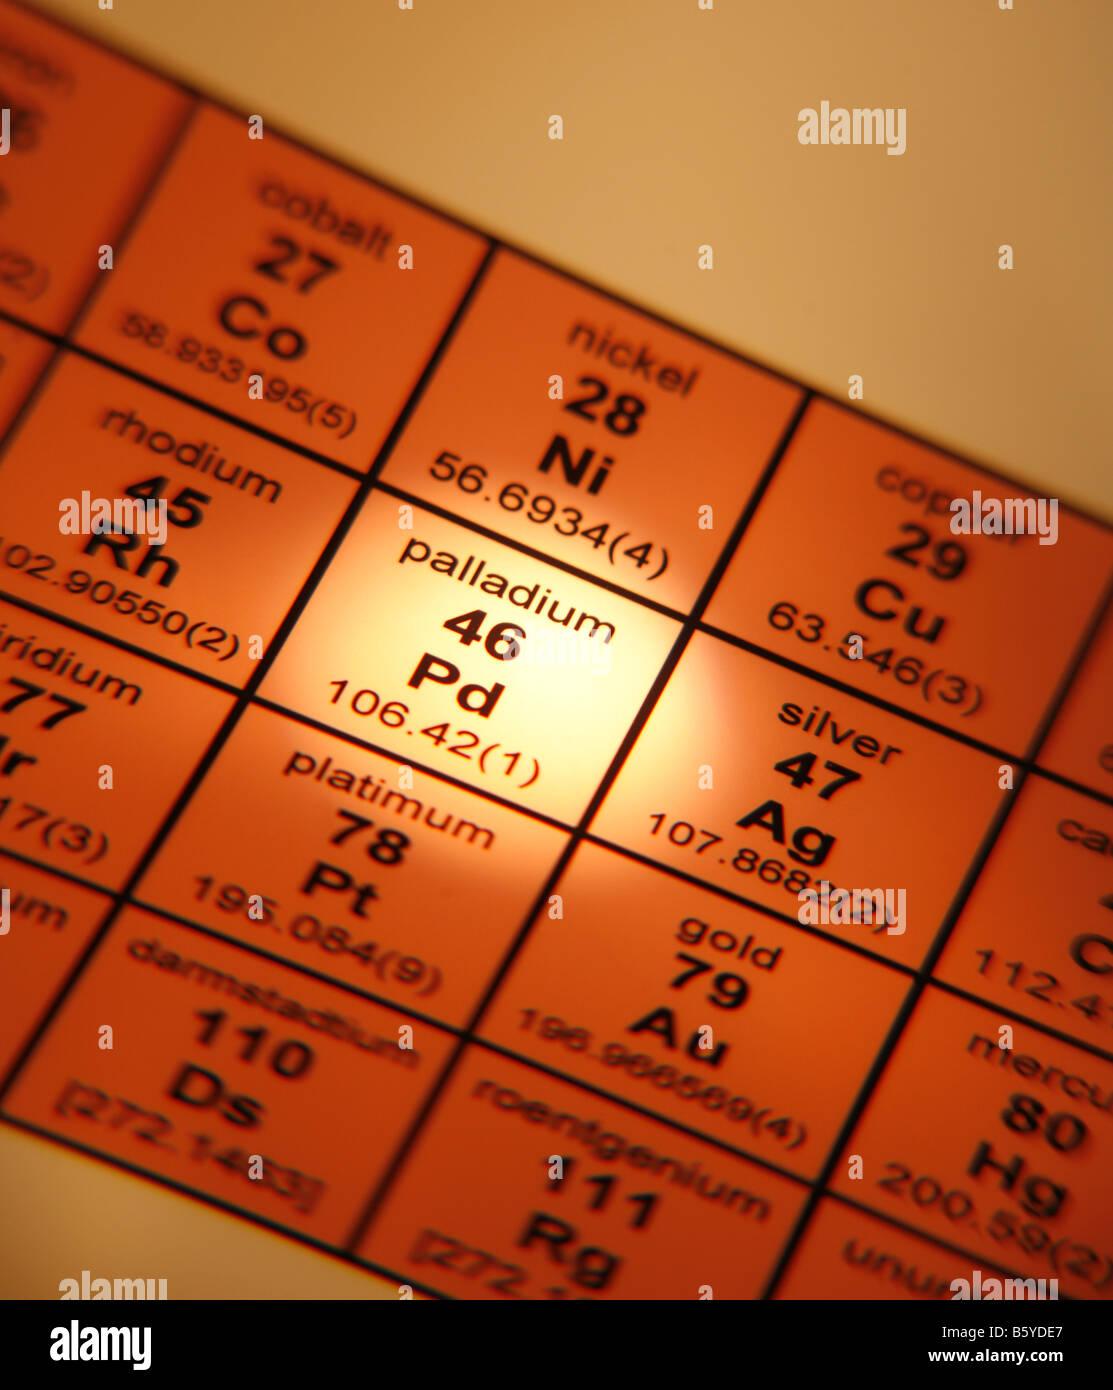 Periodic Table Of Elements Palladium Stock Photo 20886943 Alamy